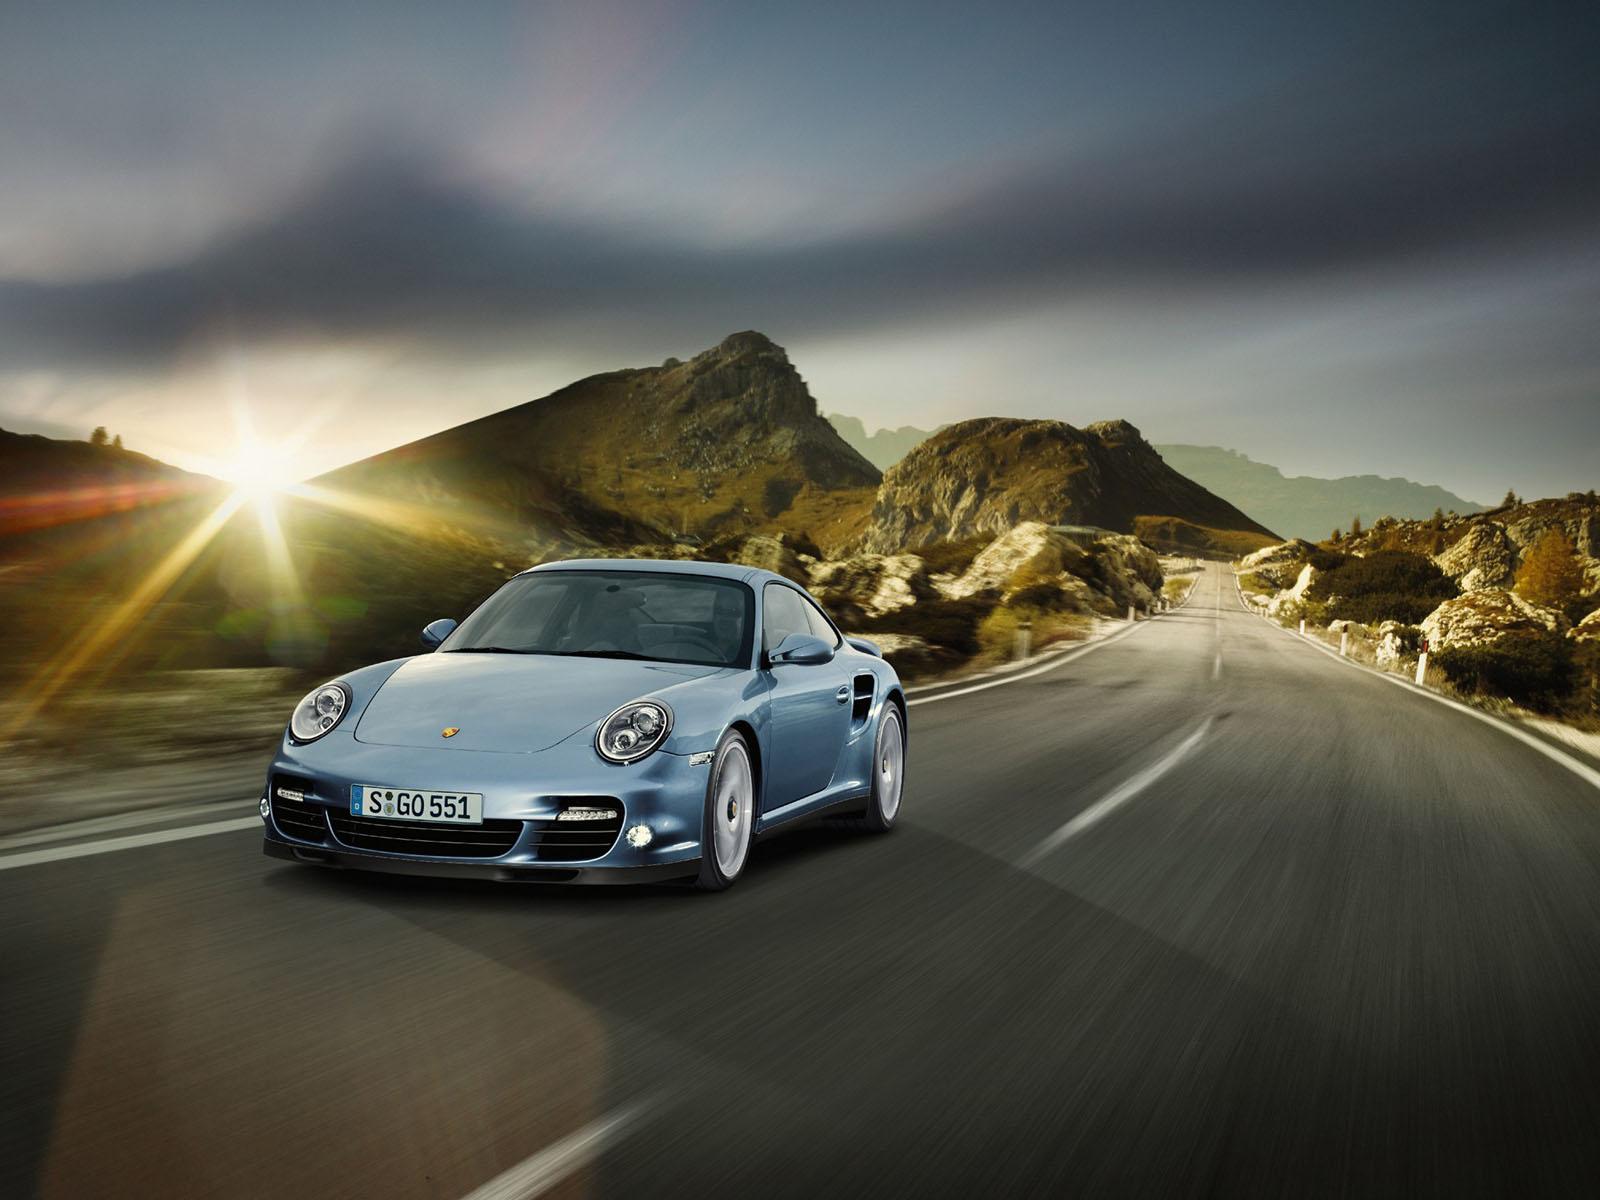 wallpapers Porsche 911 Turbo Car Wallpapers 1600x1200